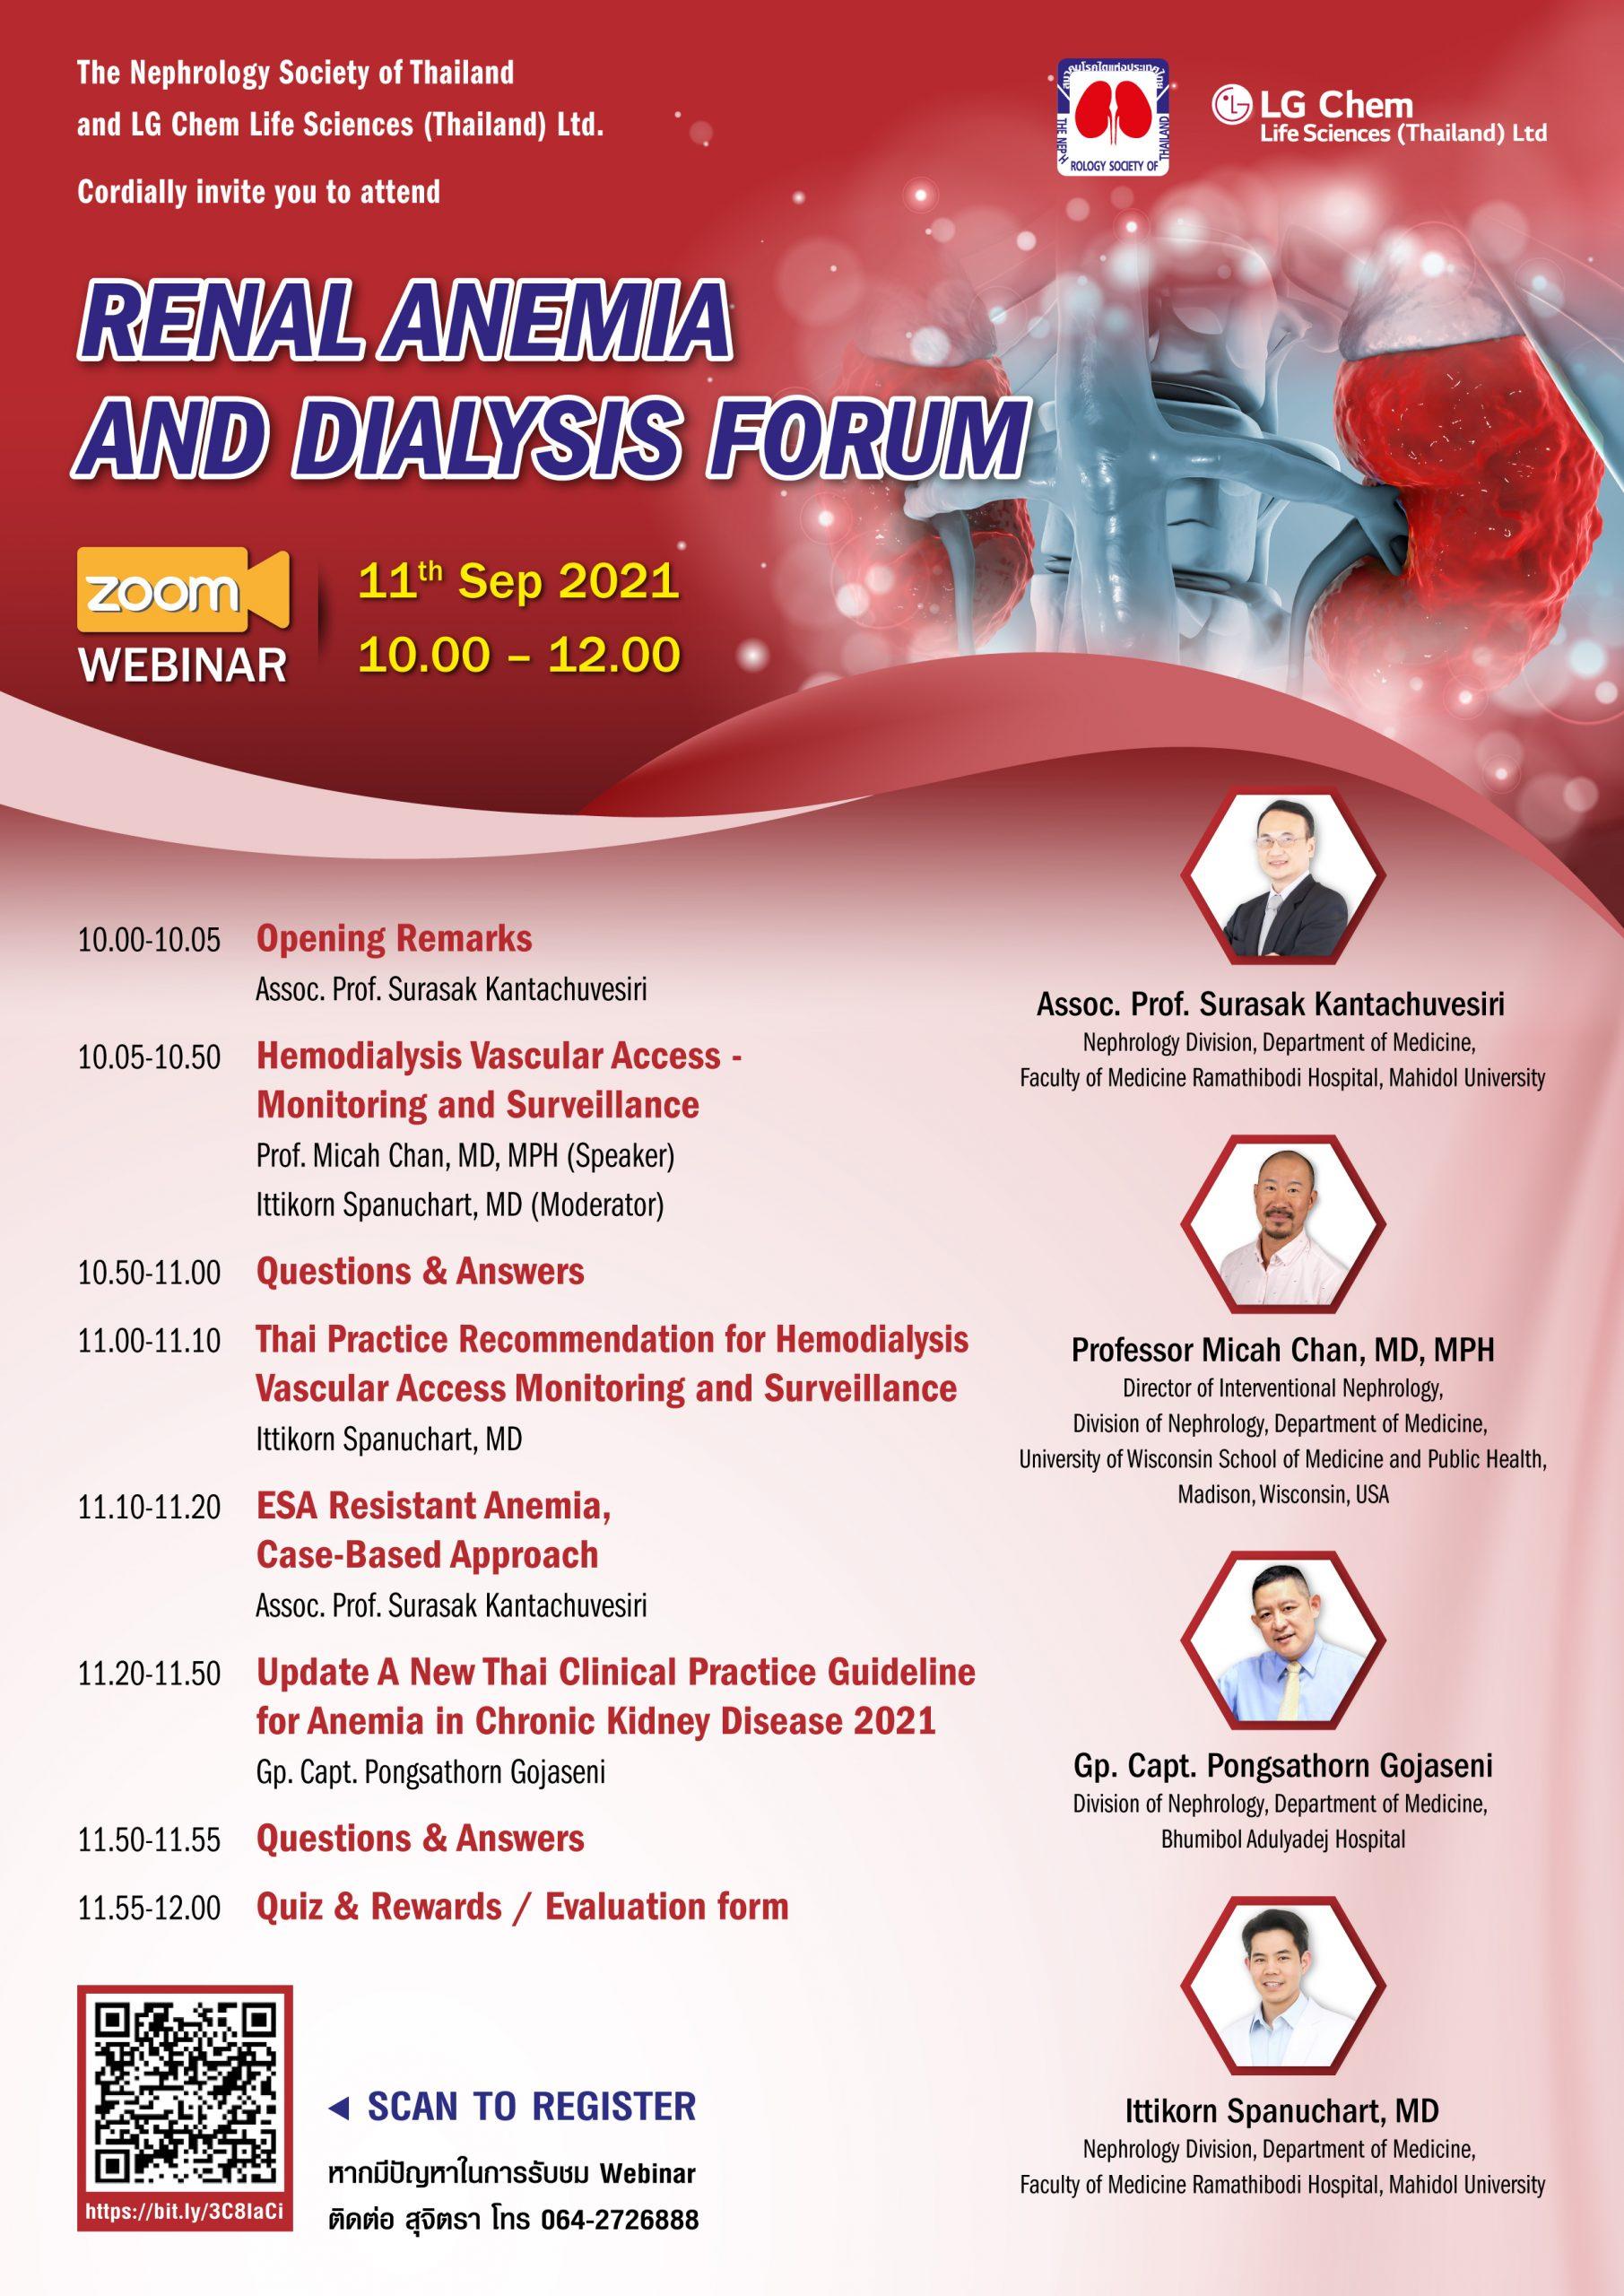 Renal Anemia and Dialysis Forum Poster A4 Final Sep 11_2021 C